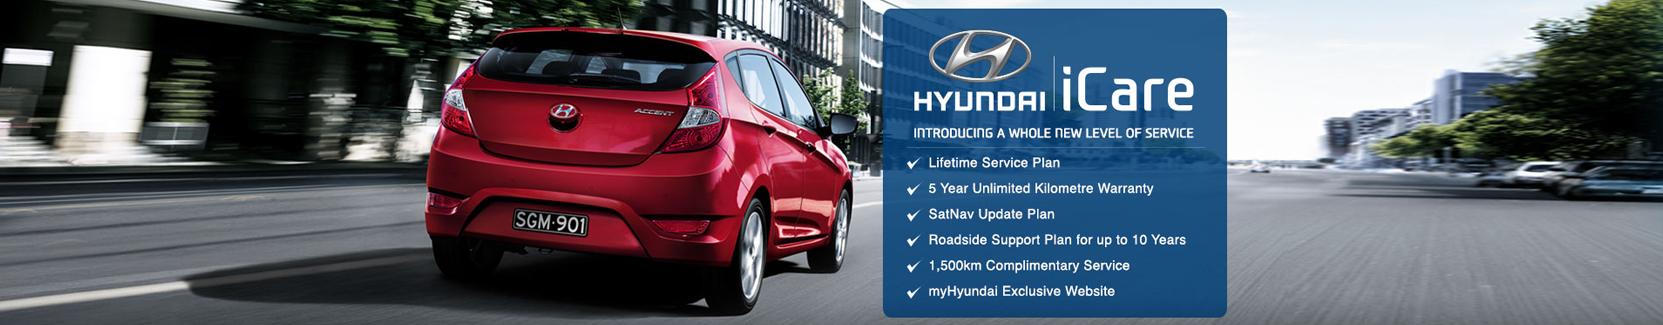 Hyundai iCare. Lifetime Service Plan and 5 year unlimited kilometre warranty.